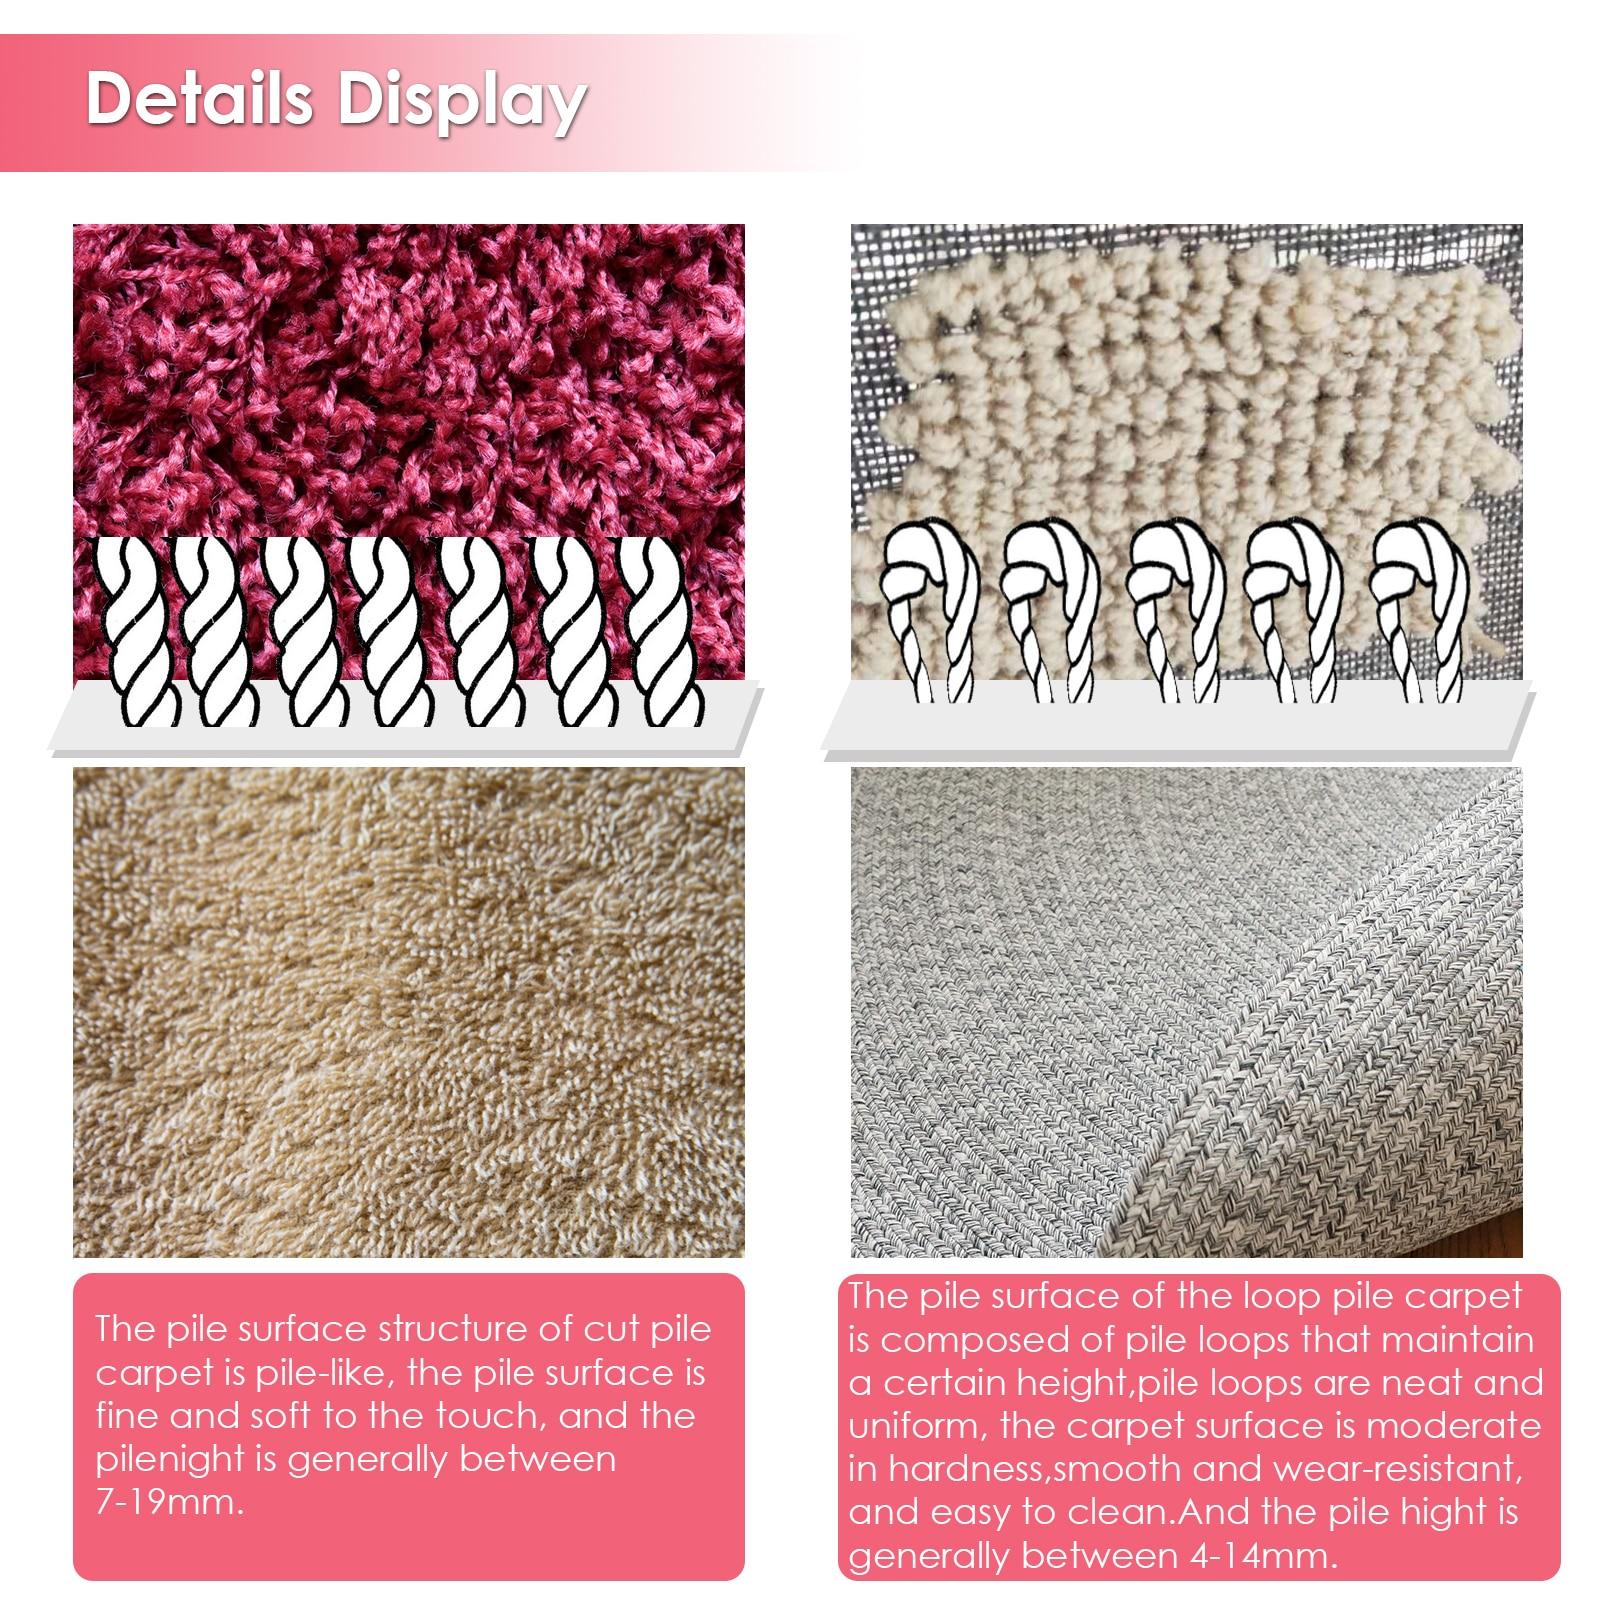 2 in 1 PinkTufting Gun Cut Pile and Loop Pile Electric Carpet RugGuns Carpet Weaving KnittingMachine for DIY, Knitting enlarge